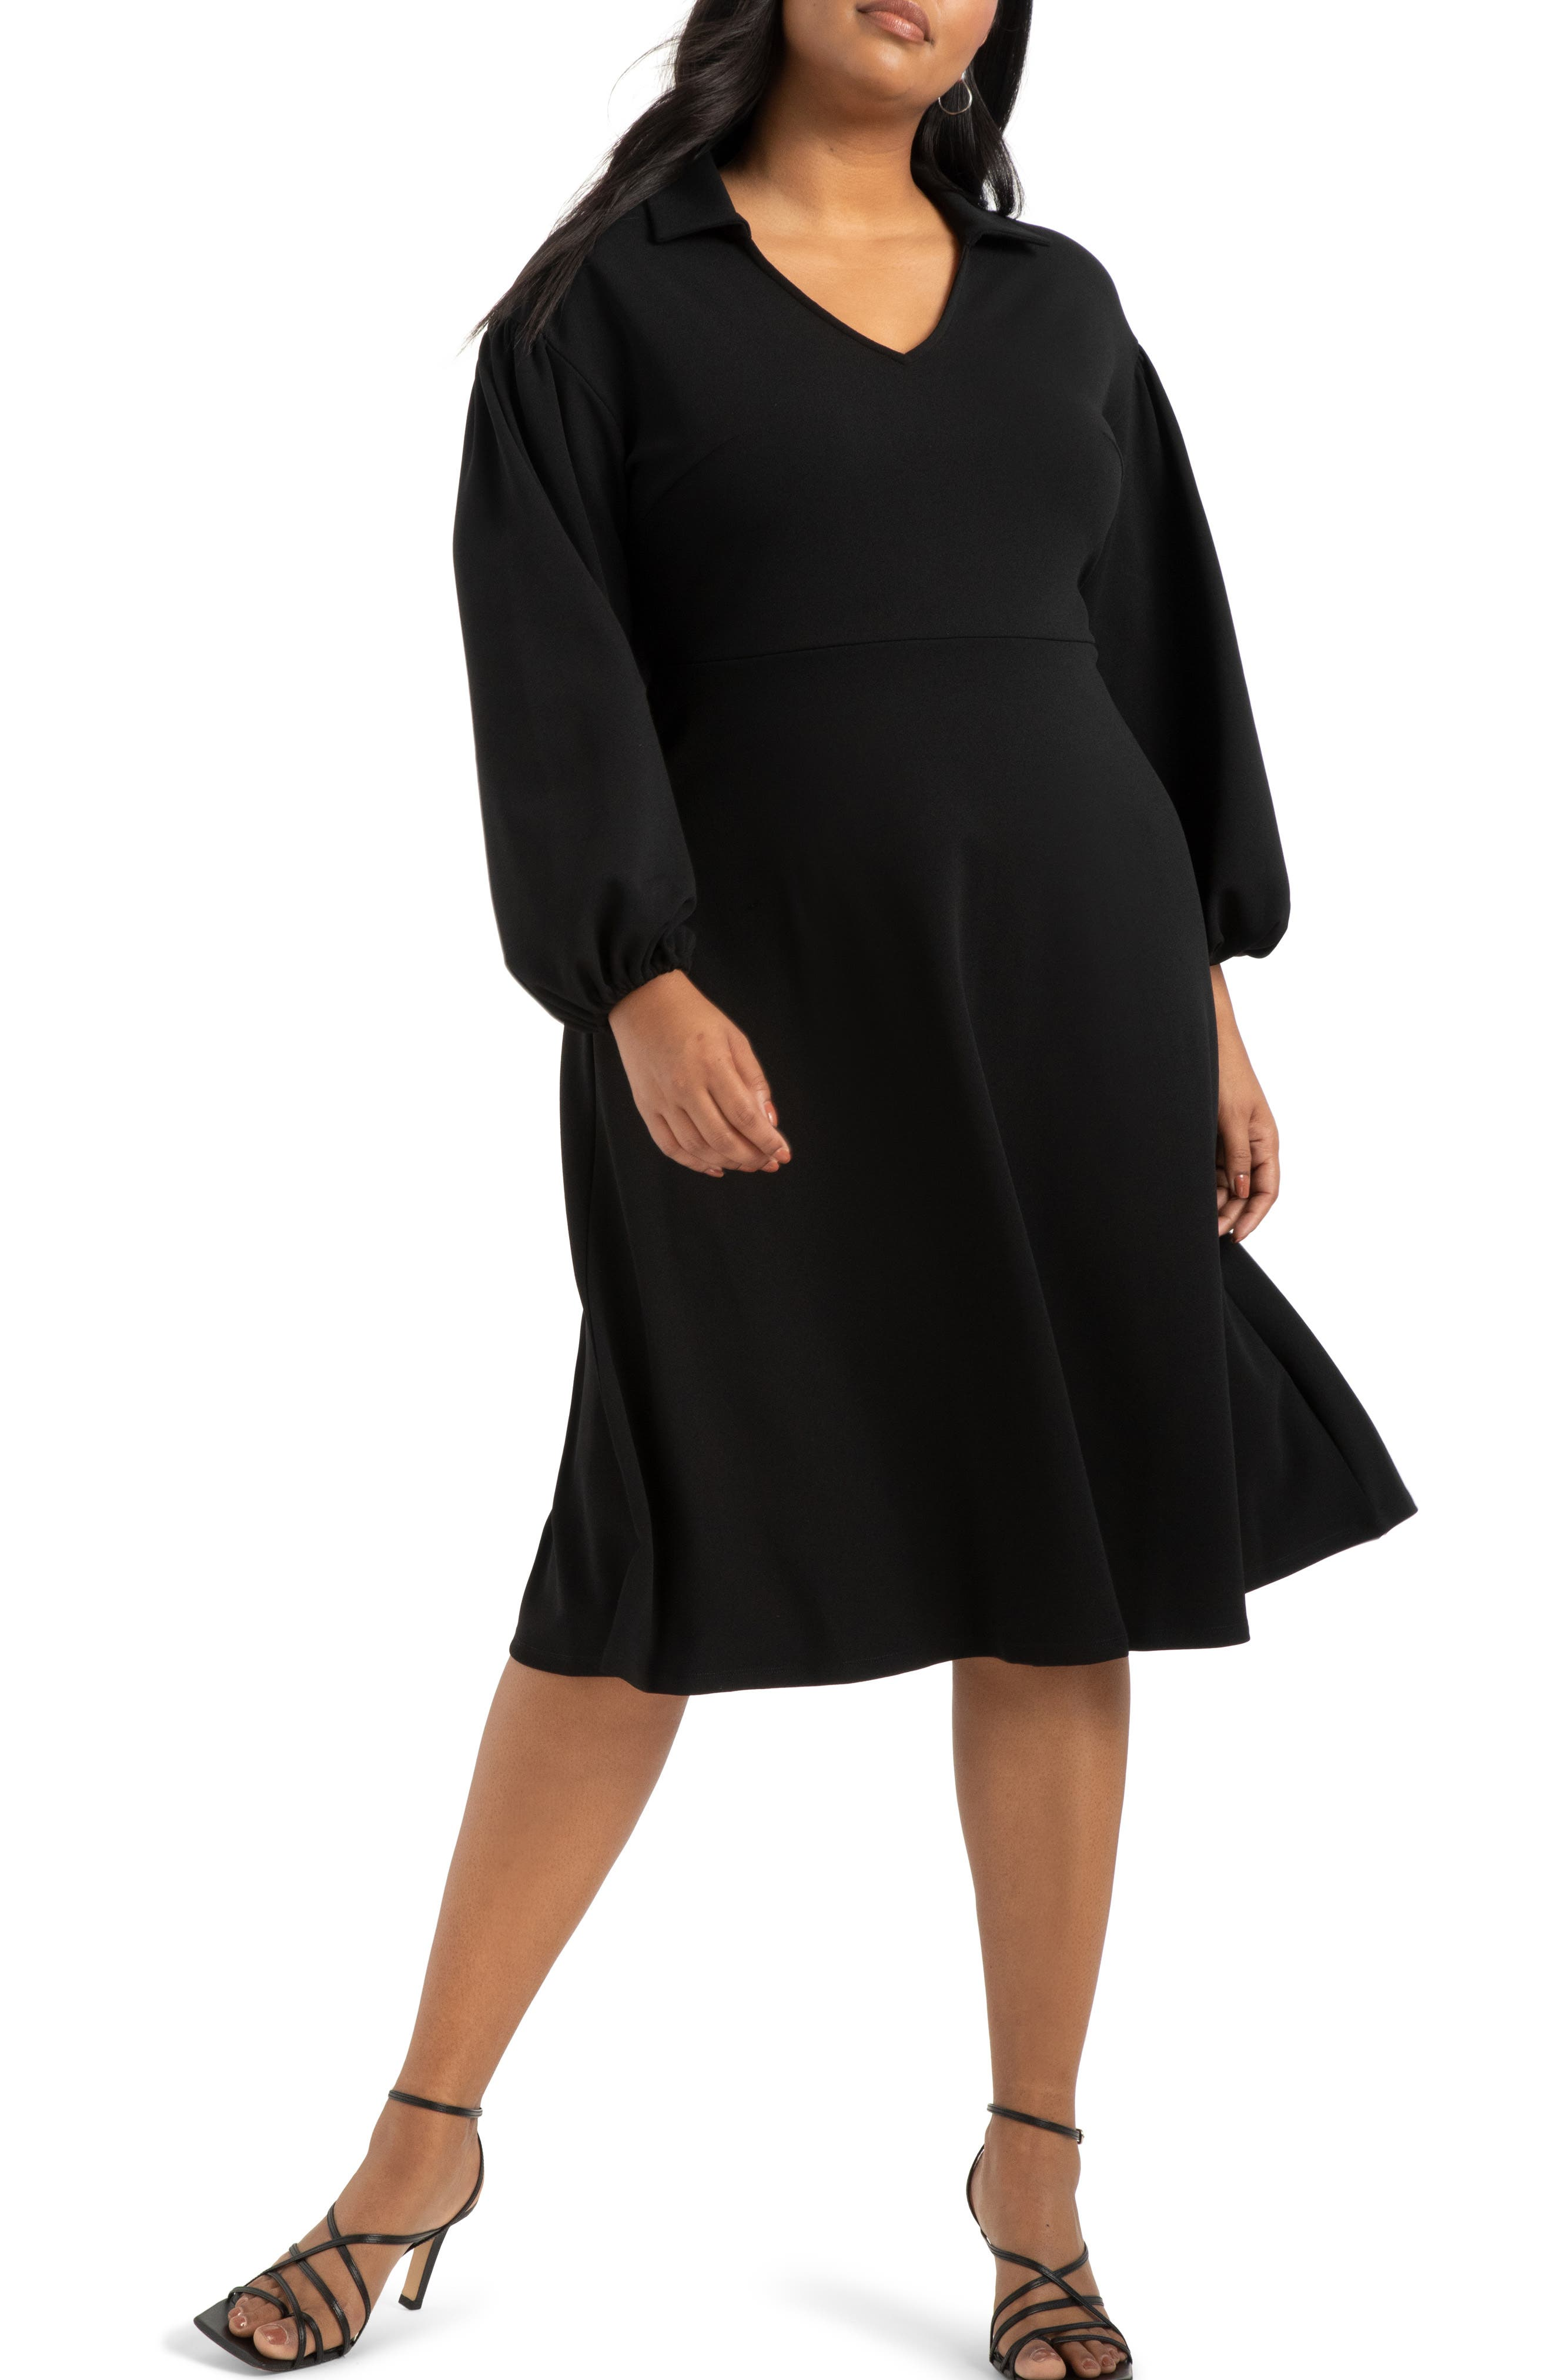 70s Prom, Formal, Evening, Party Dresses Plus Size Womens Eloquii Drop Shoulder Fit  Flare Midi Dress Size 14W - Black $99.95 AT vintagedancer.com